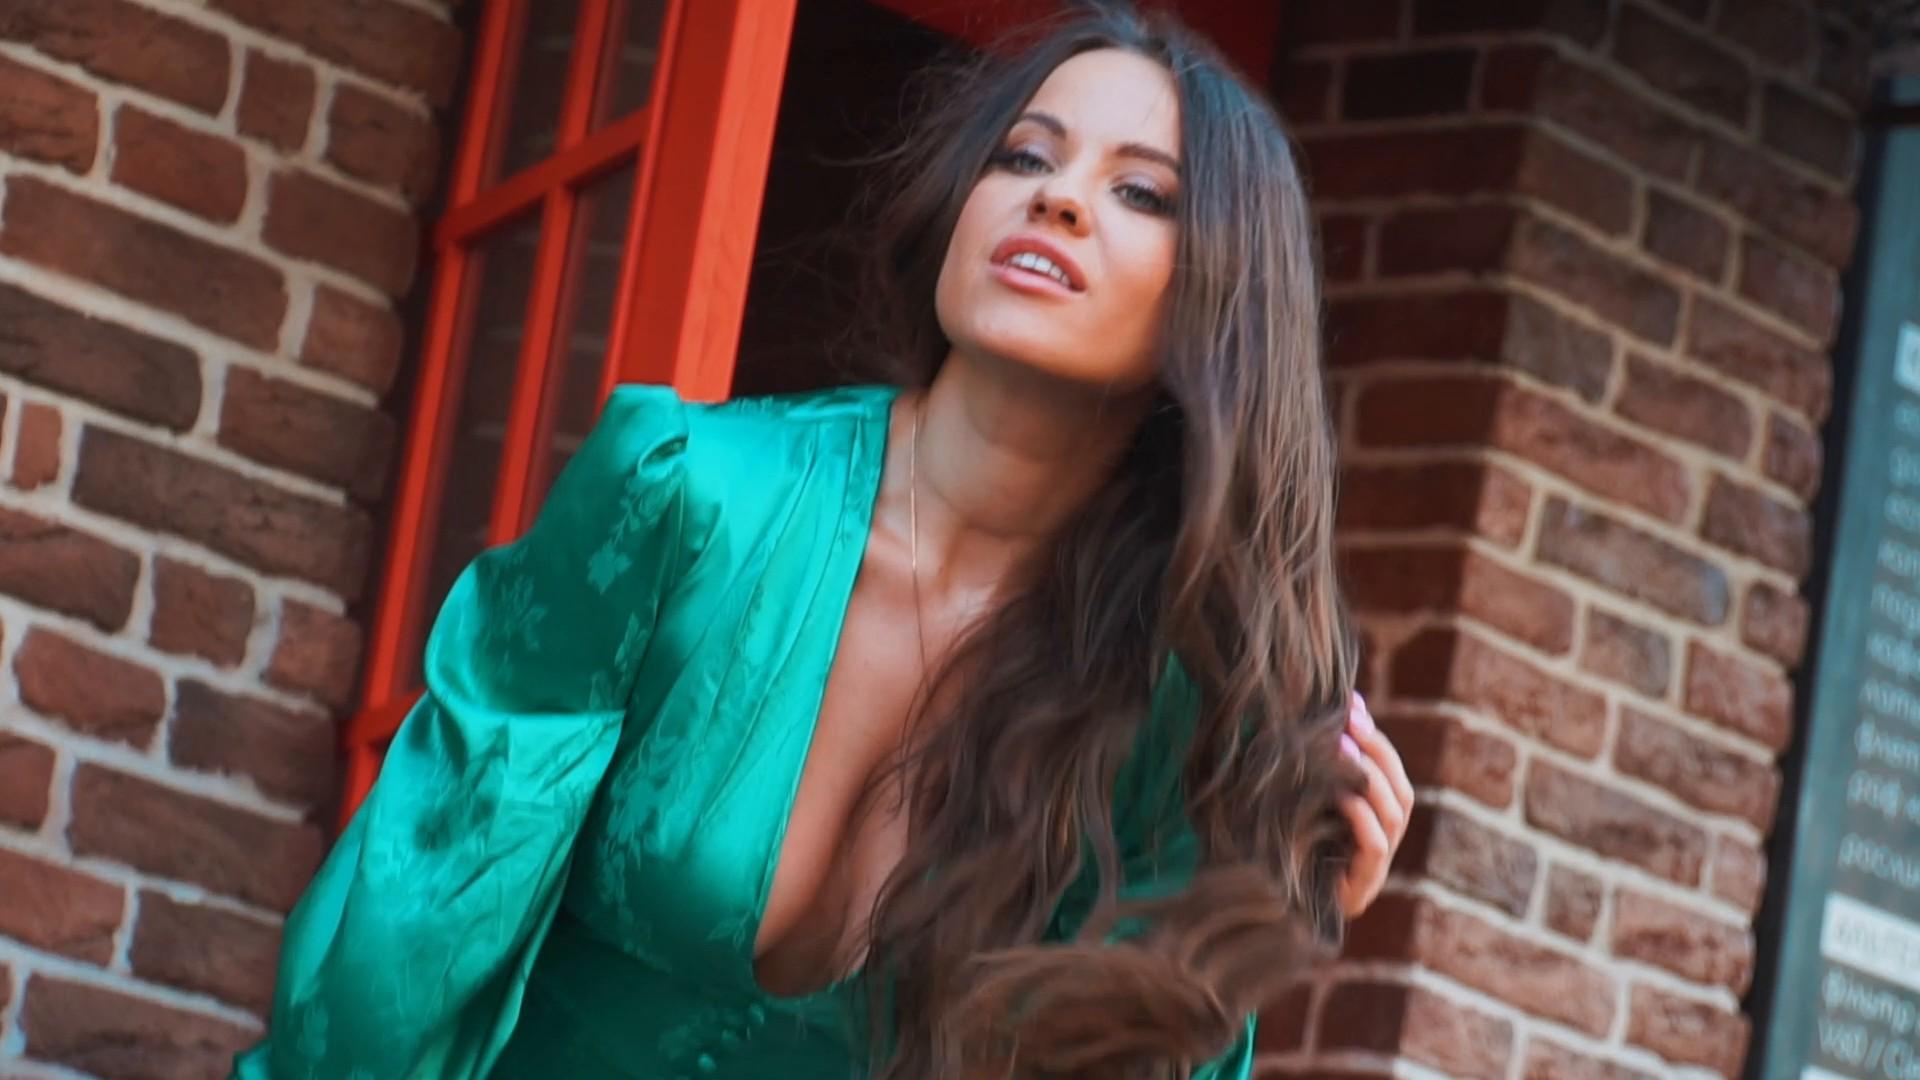 Dana Kiev 25 y.o. - intelligent lady - small public photo.